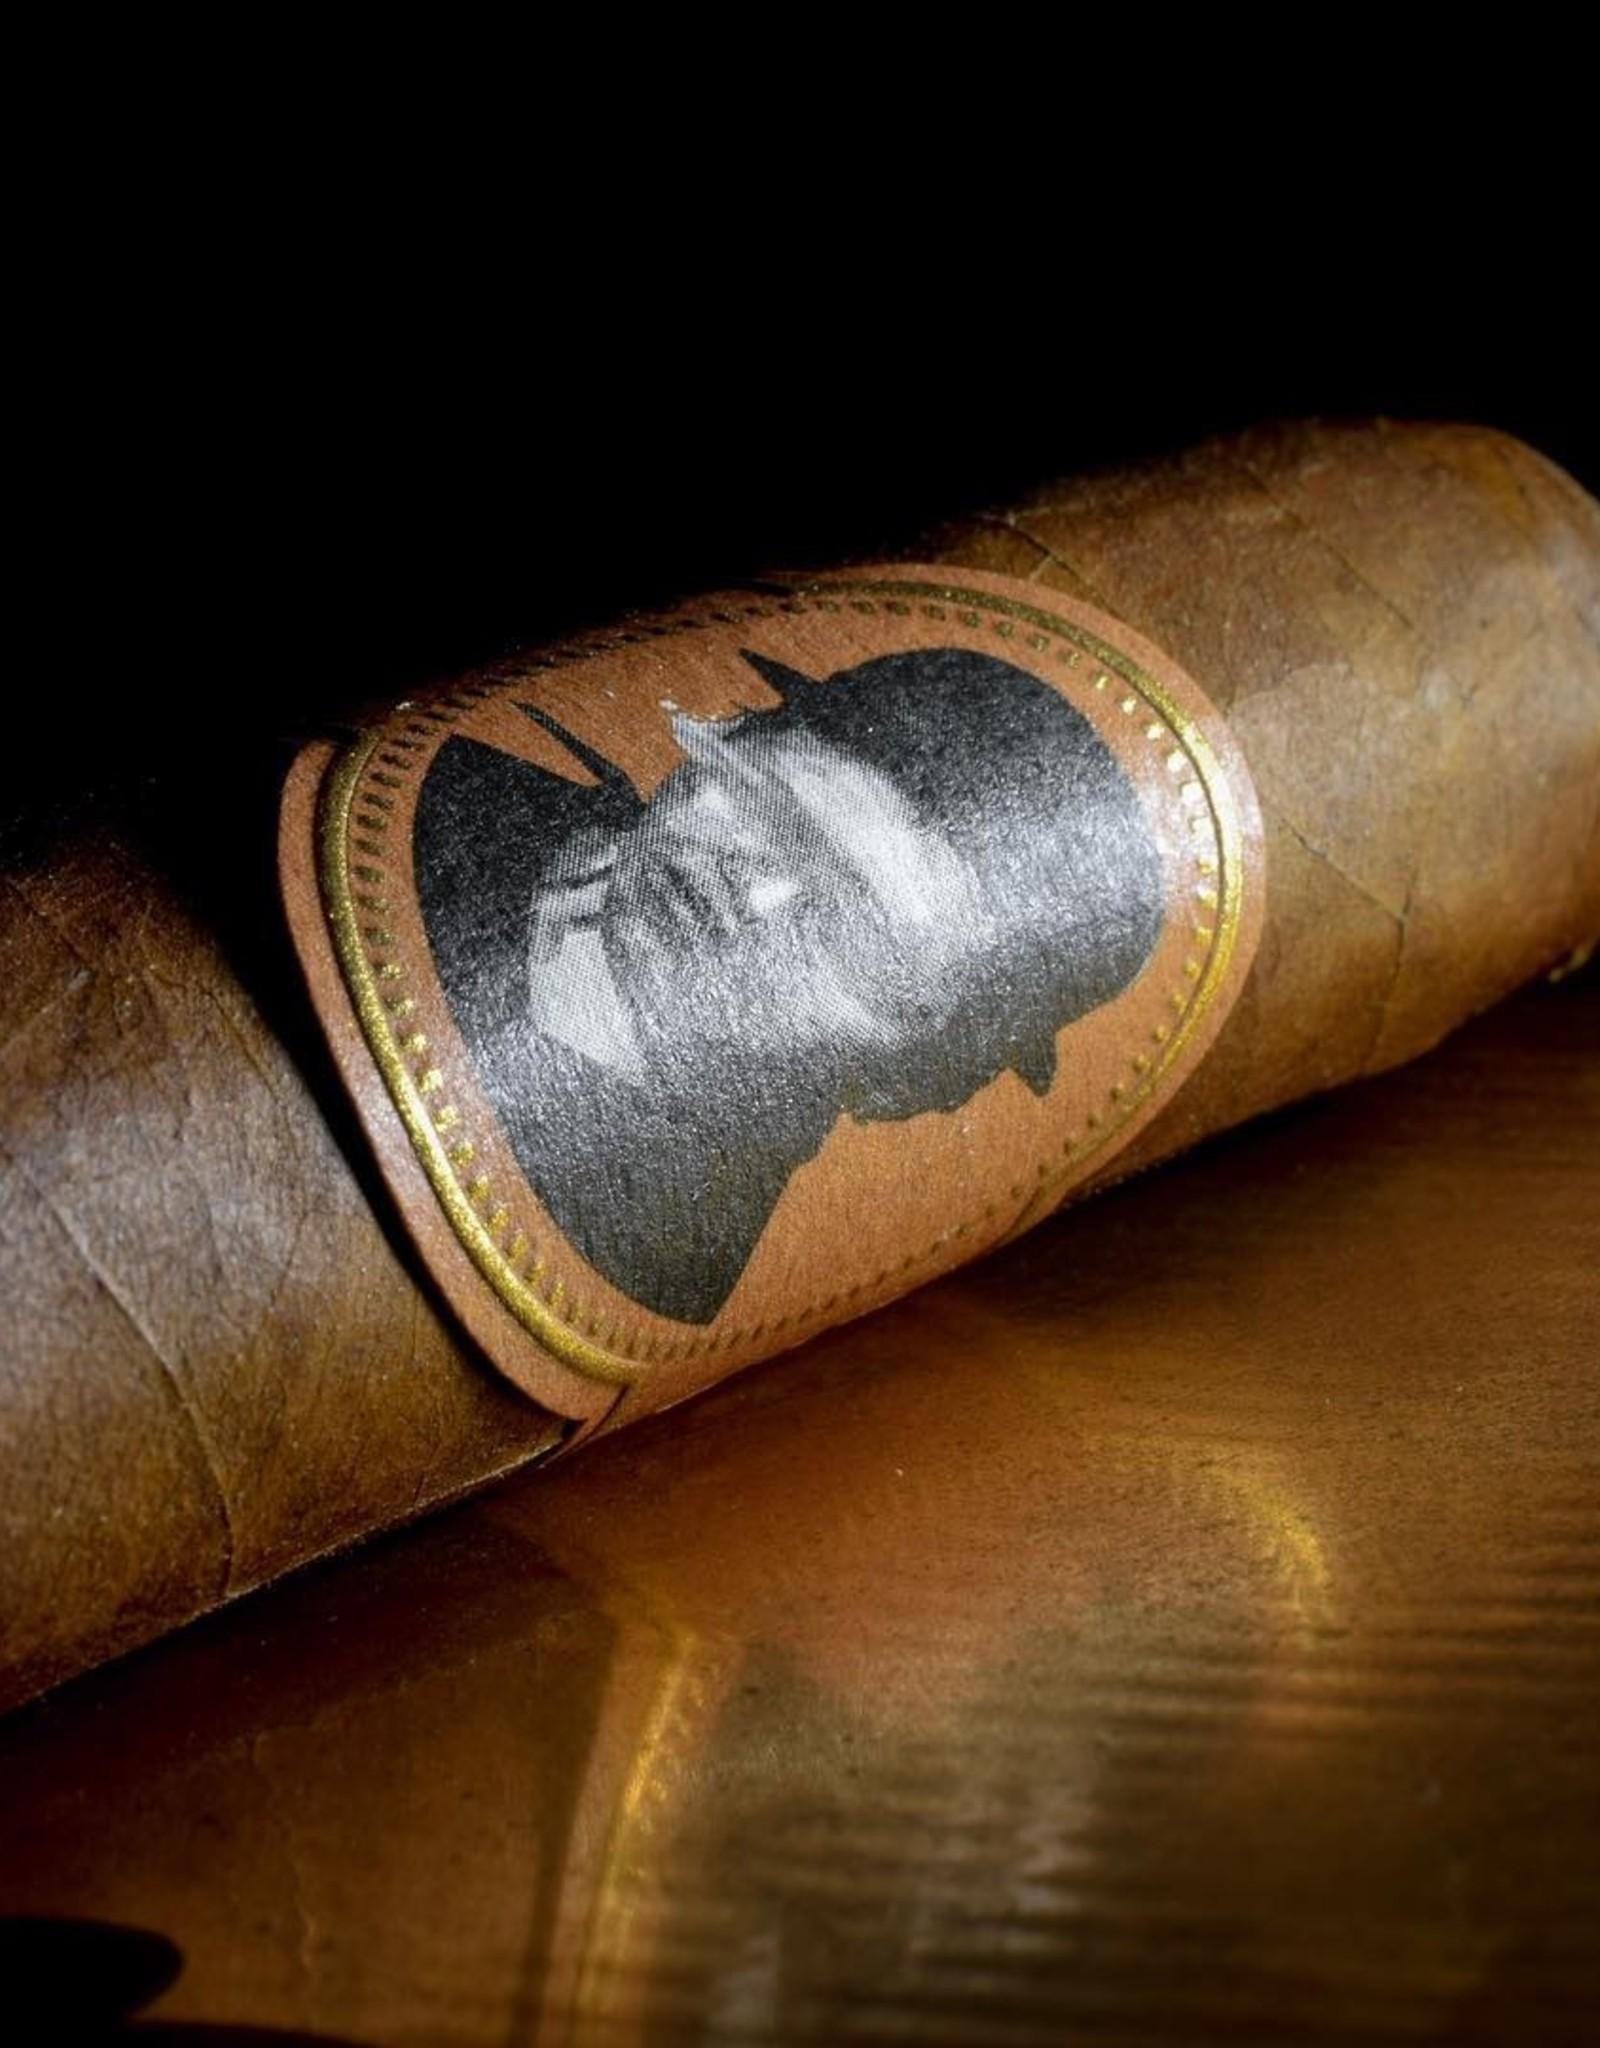 Caldwell Cigar Co Caldwell Blind Man's Bluff Habano Toro 6 x 52 Single